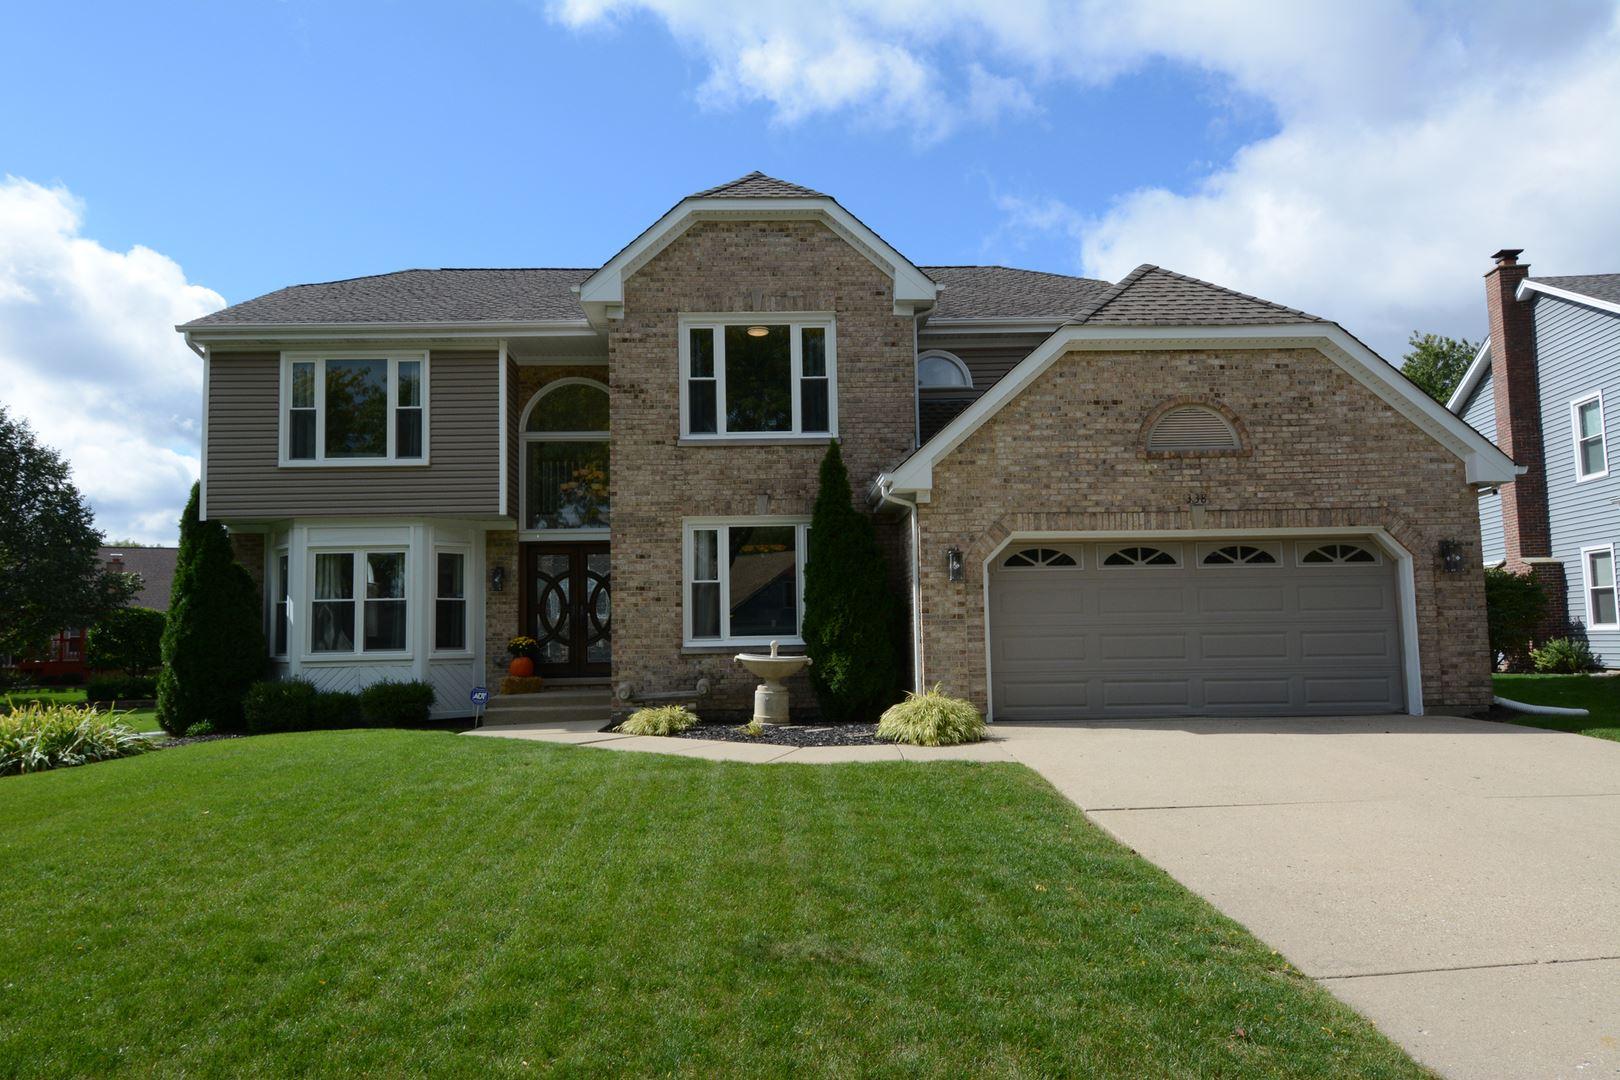 338 Ridgewood Drive, Bloomingdale, IL 60108 - #: 10888026